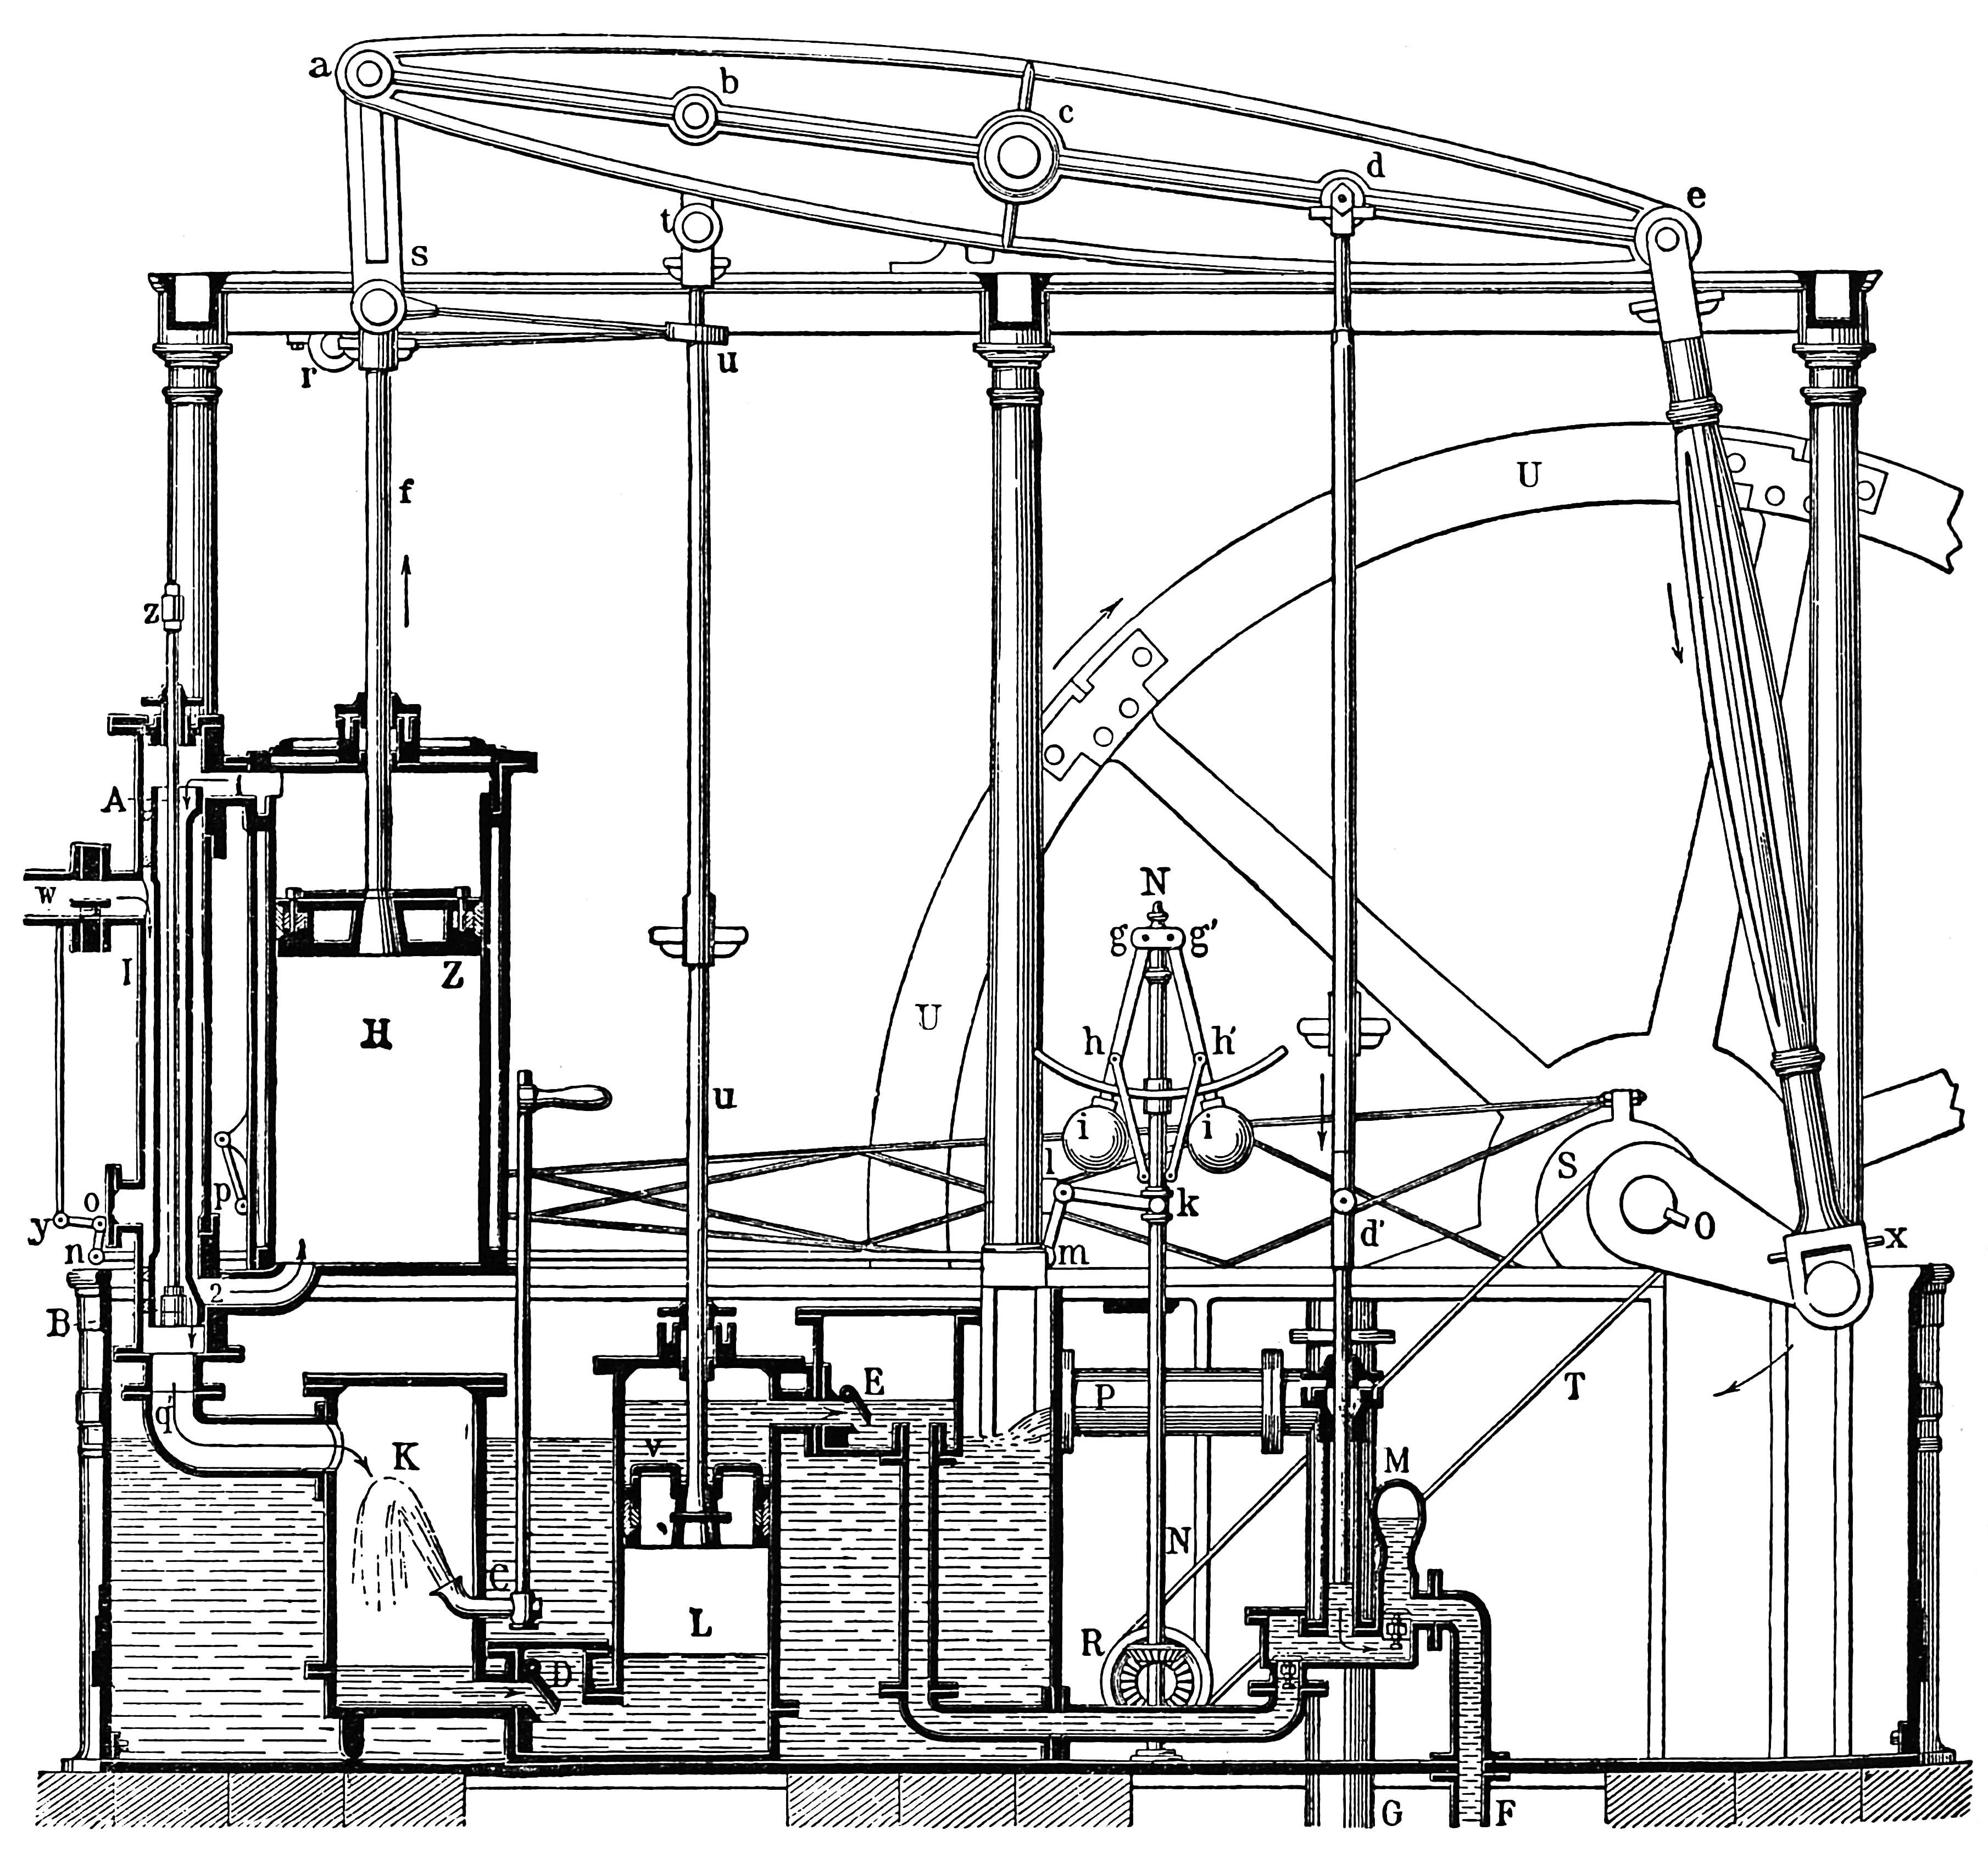 James Watt Steam Engine Diagram James Watt Steam Engine Of James Watt Steam Engine Diagram